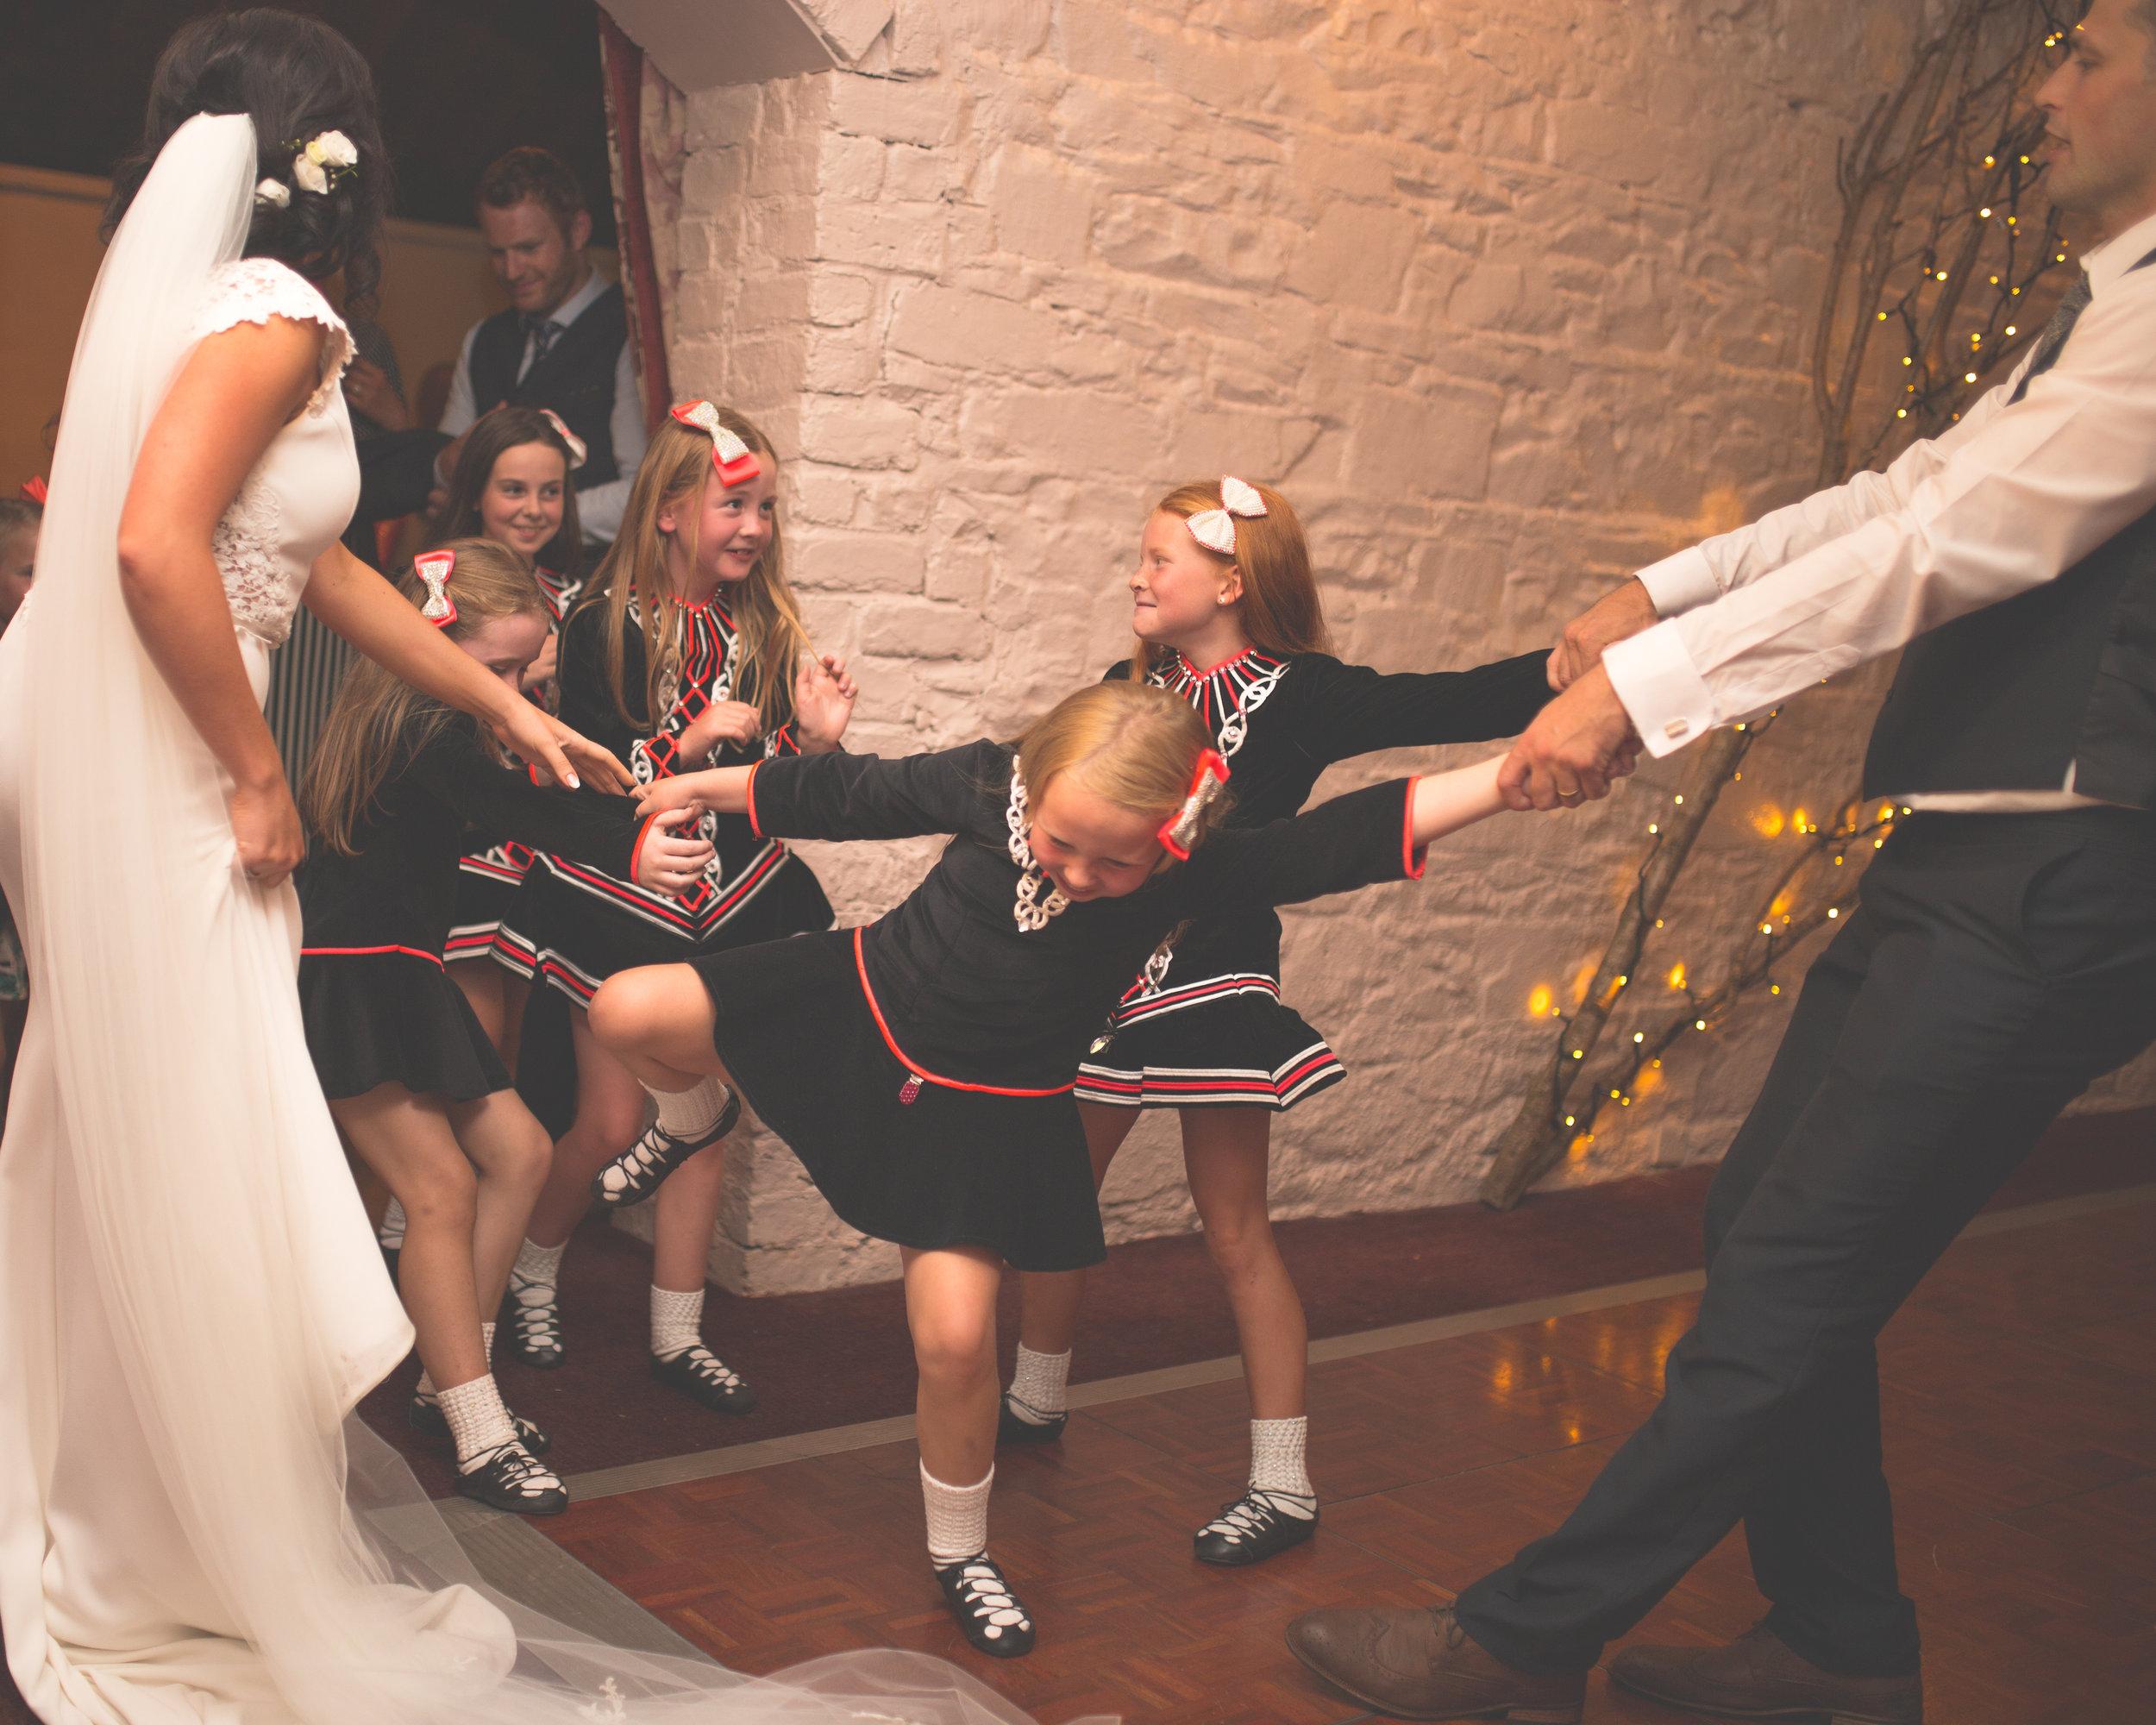 Brian McEwan Wedding Photography | Carol-Annee & Sean | The Dancing-57.jpg